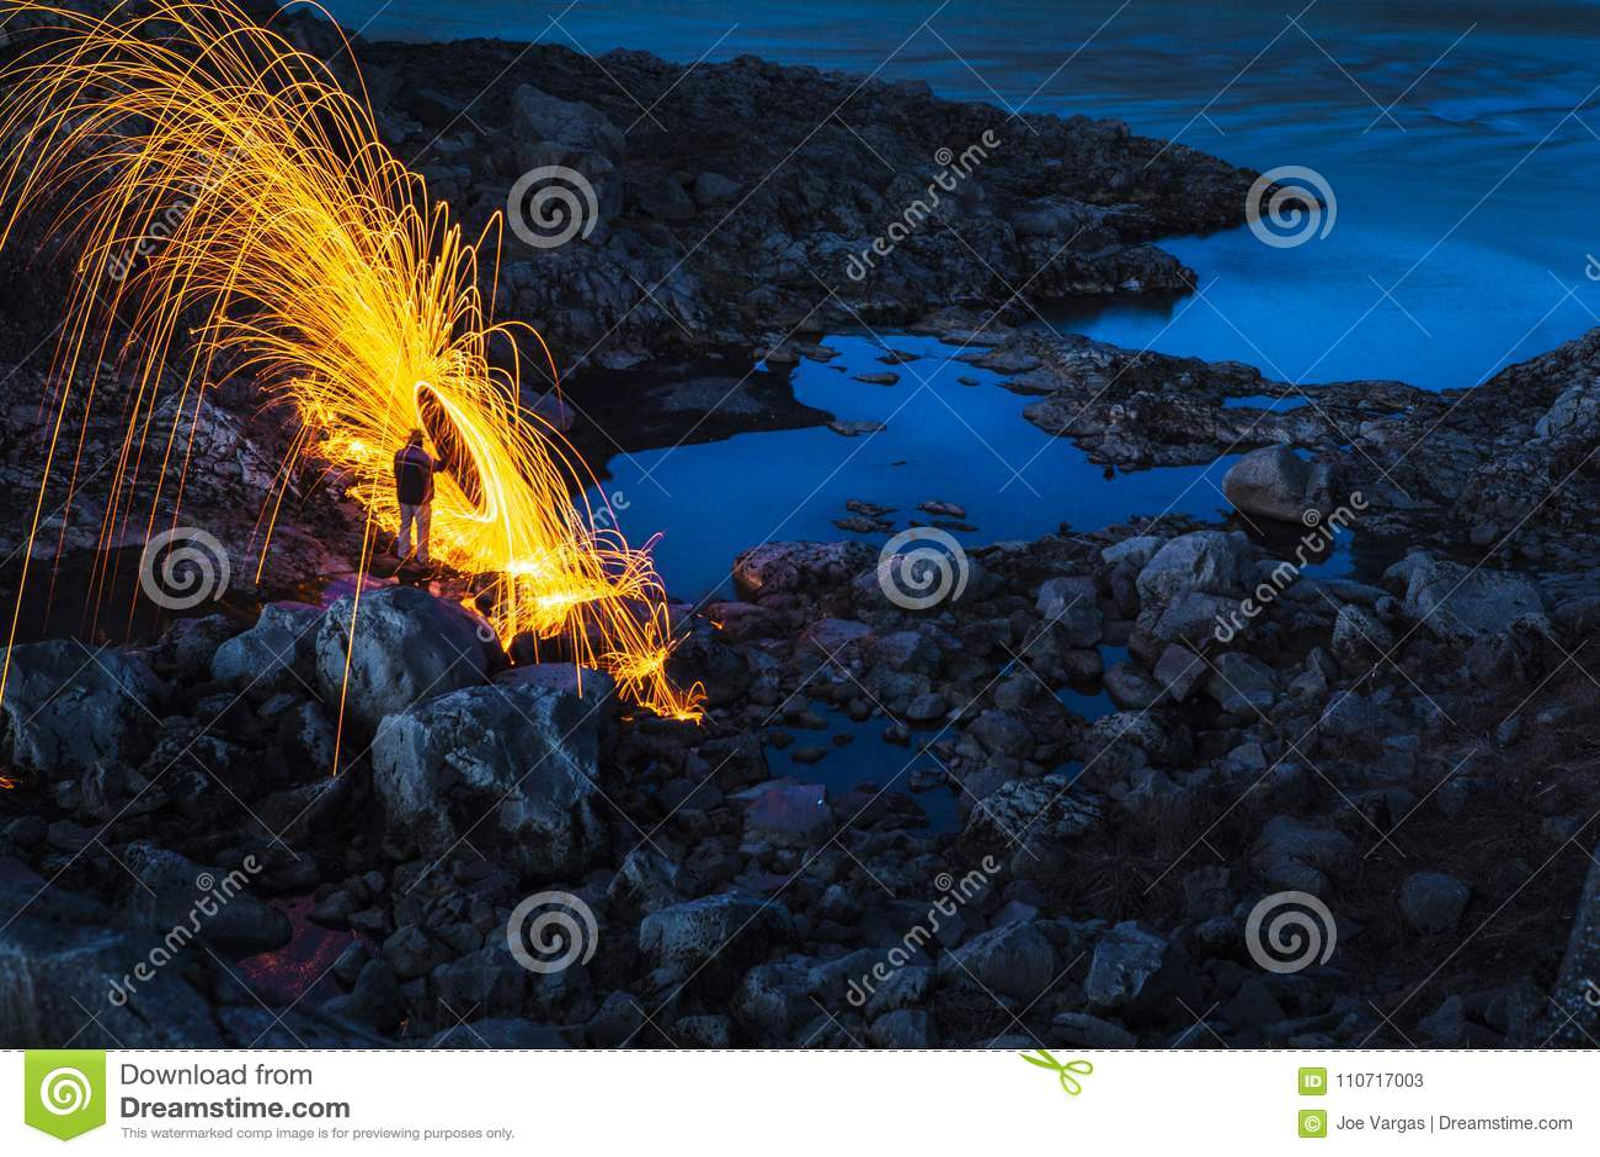 Rain of Fire in Iceland